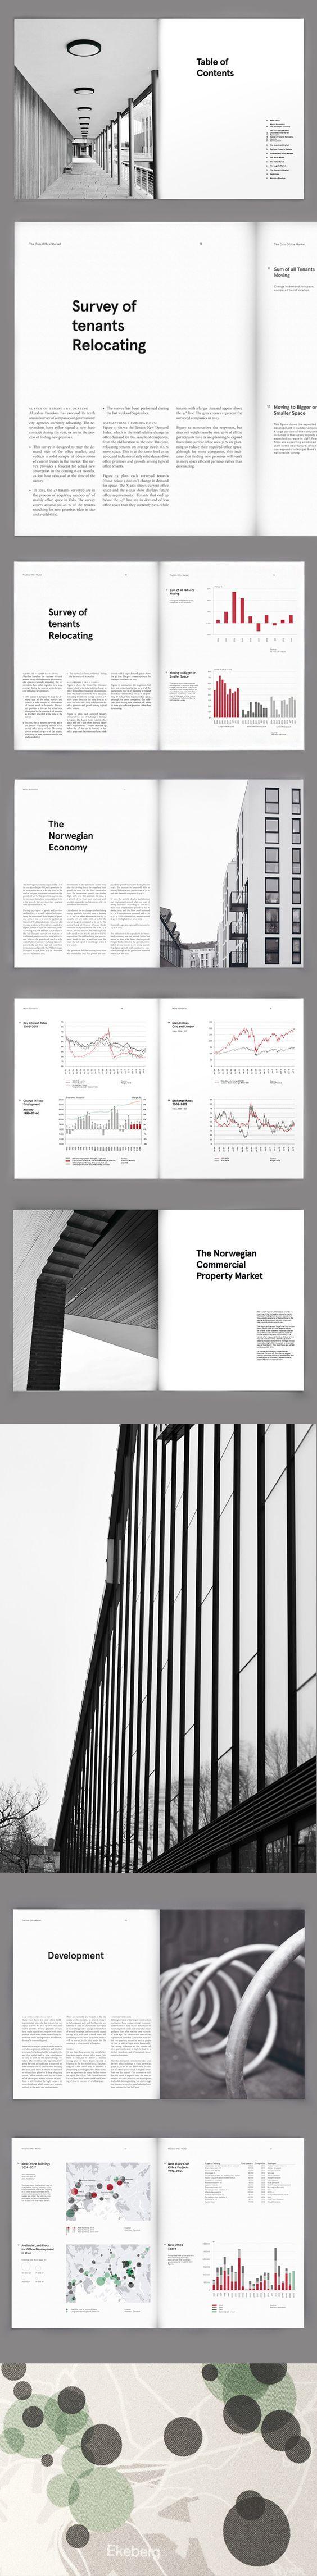 Akershus Eiendom Annual Report Layout Design | Publication and Print Design: